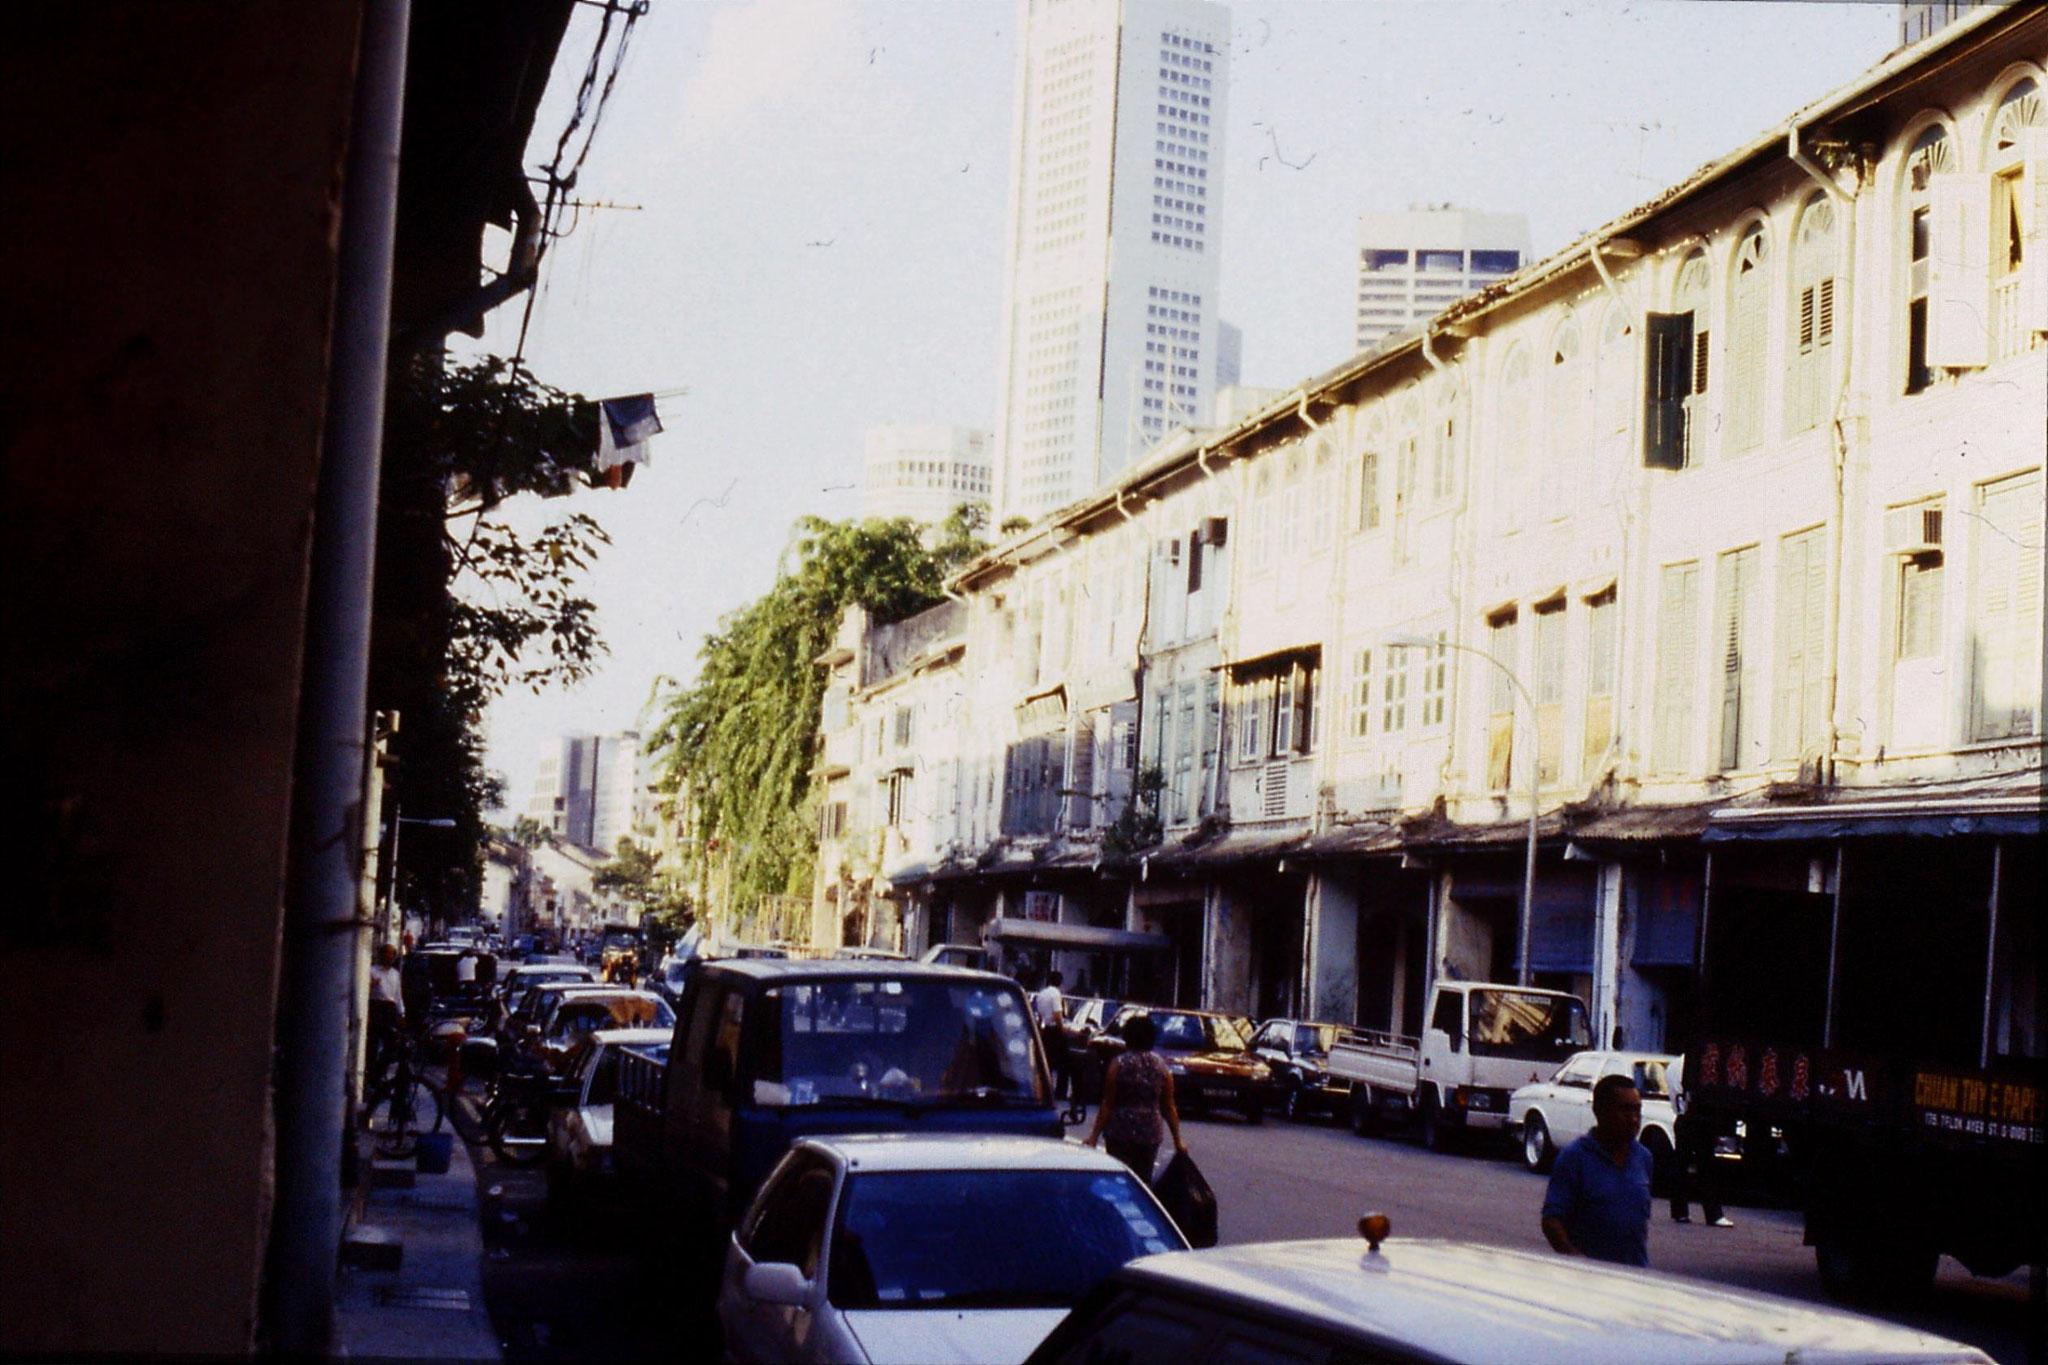 2/7/1990: 31: Singapore